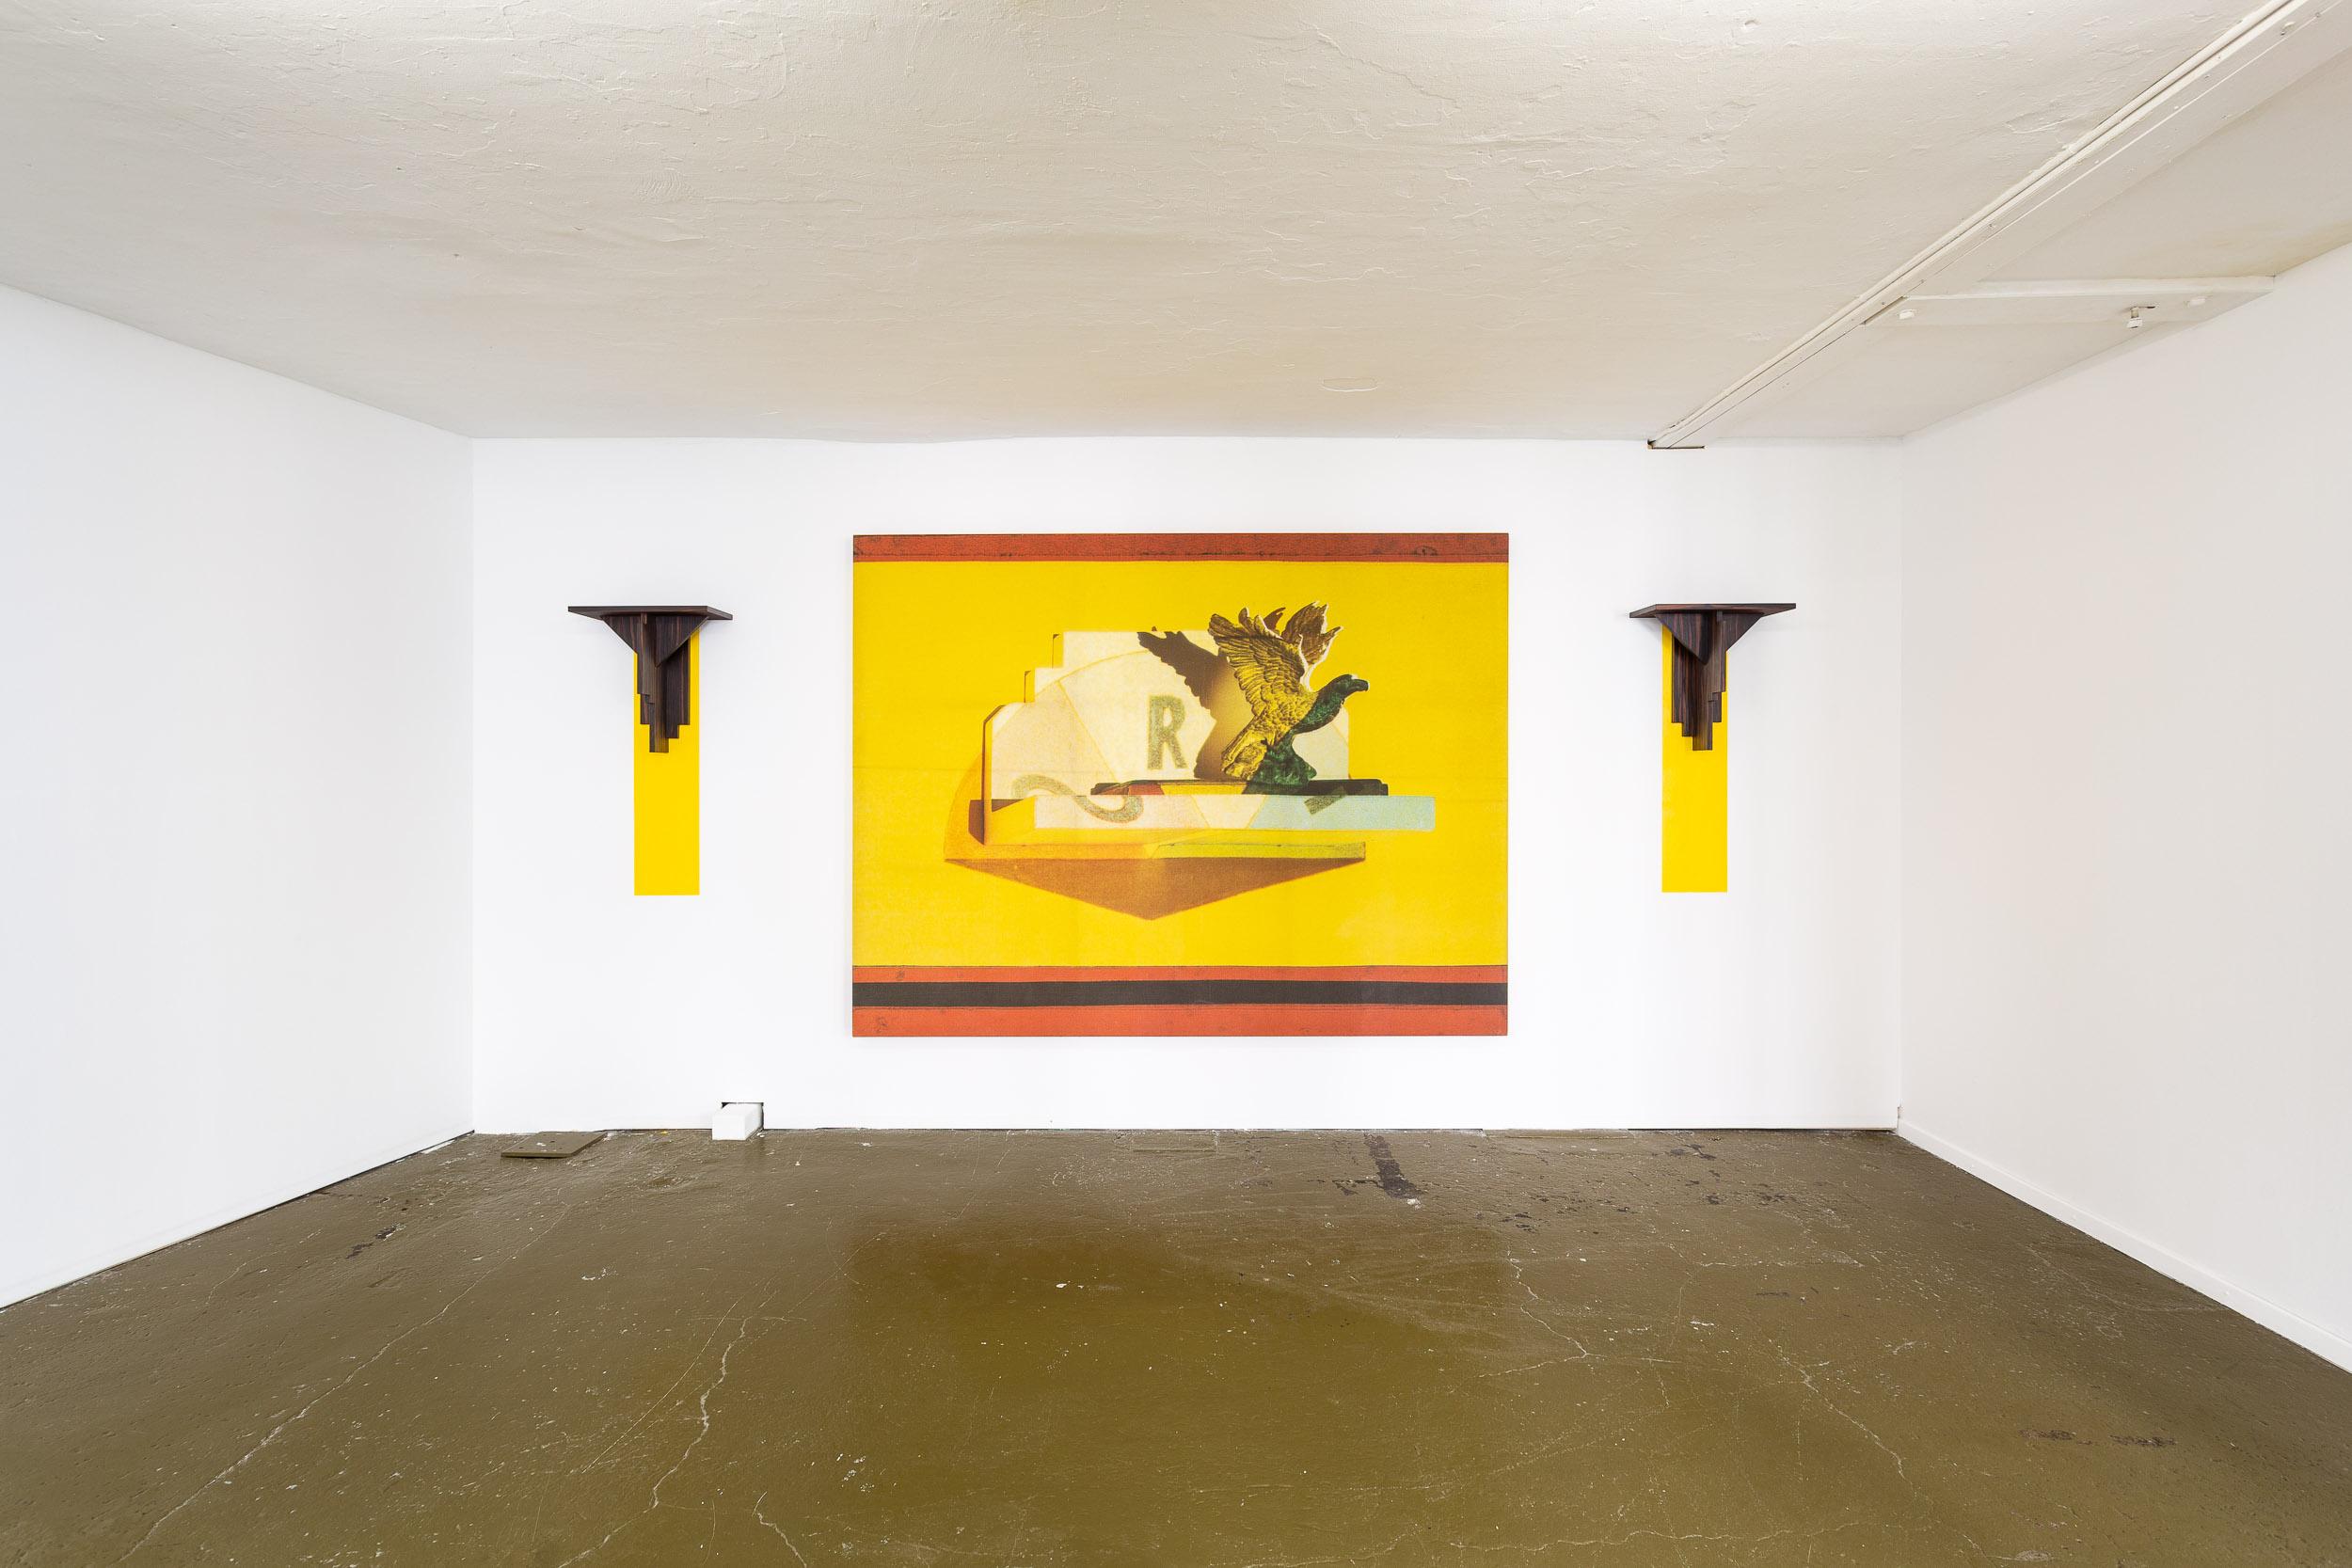 Silvie and Chérif Defraoui,  Bilderstreit (Lugar/Llano) , 1987, scanachrome on canvas, 2 wooden con- soles and wall painting, 188 x 245 cm   Photo: Kilian Bannwart